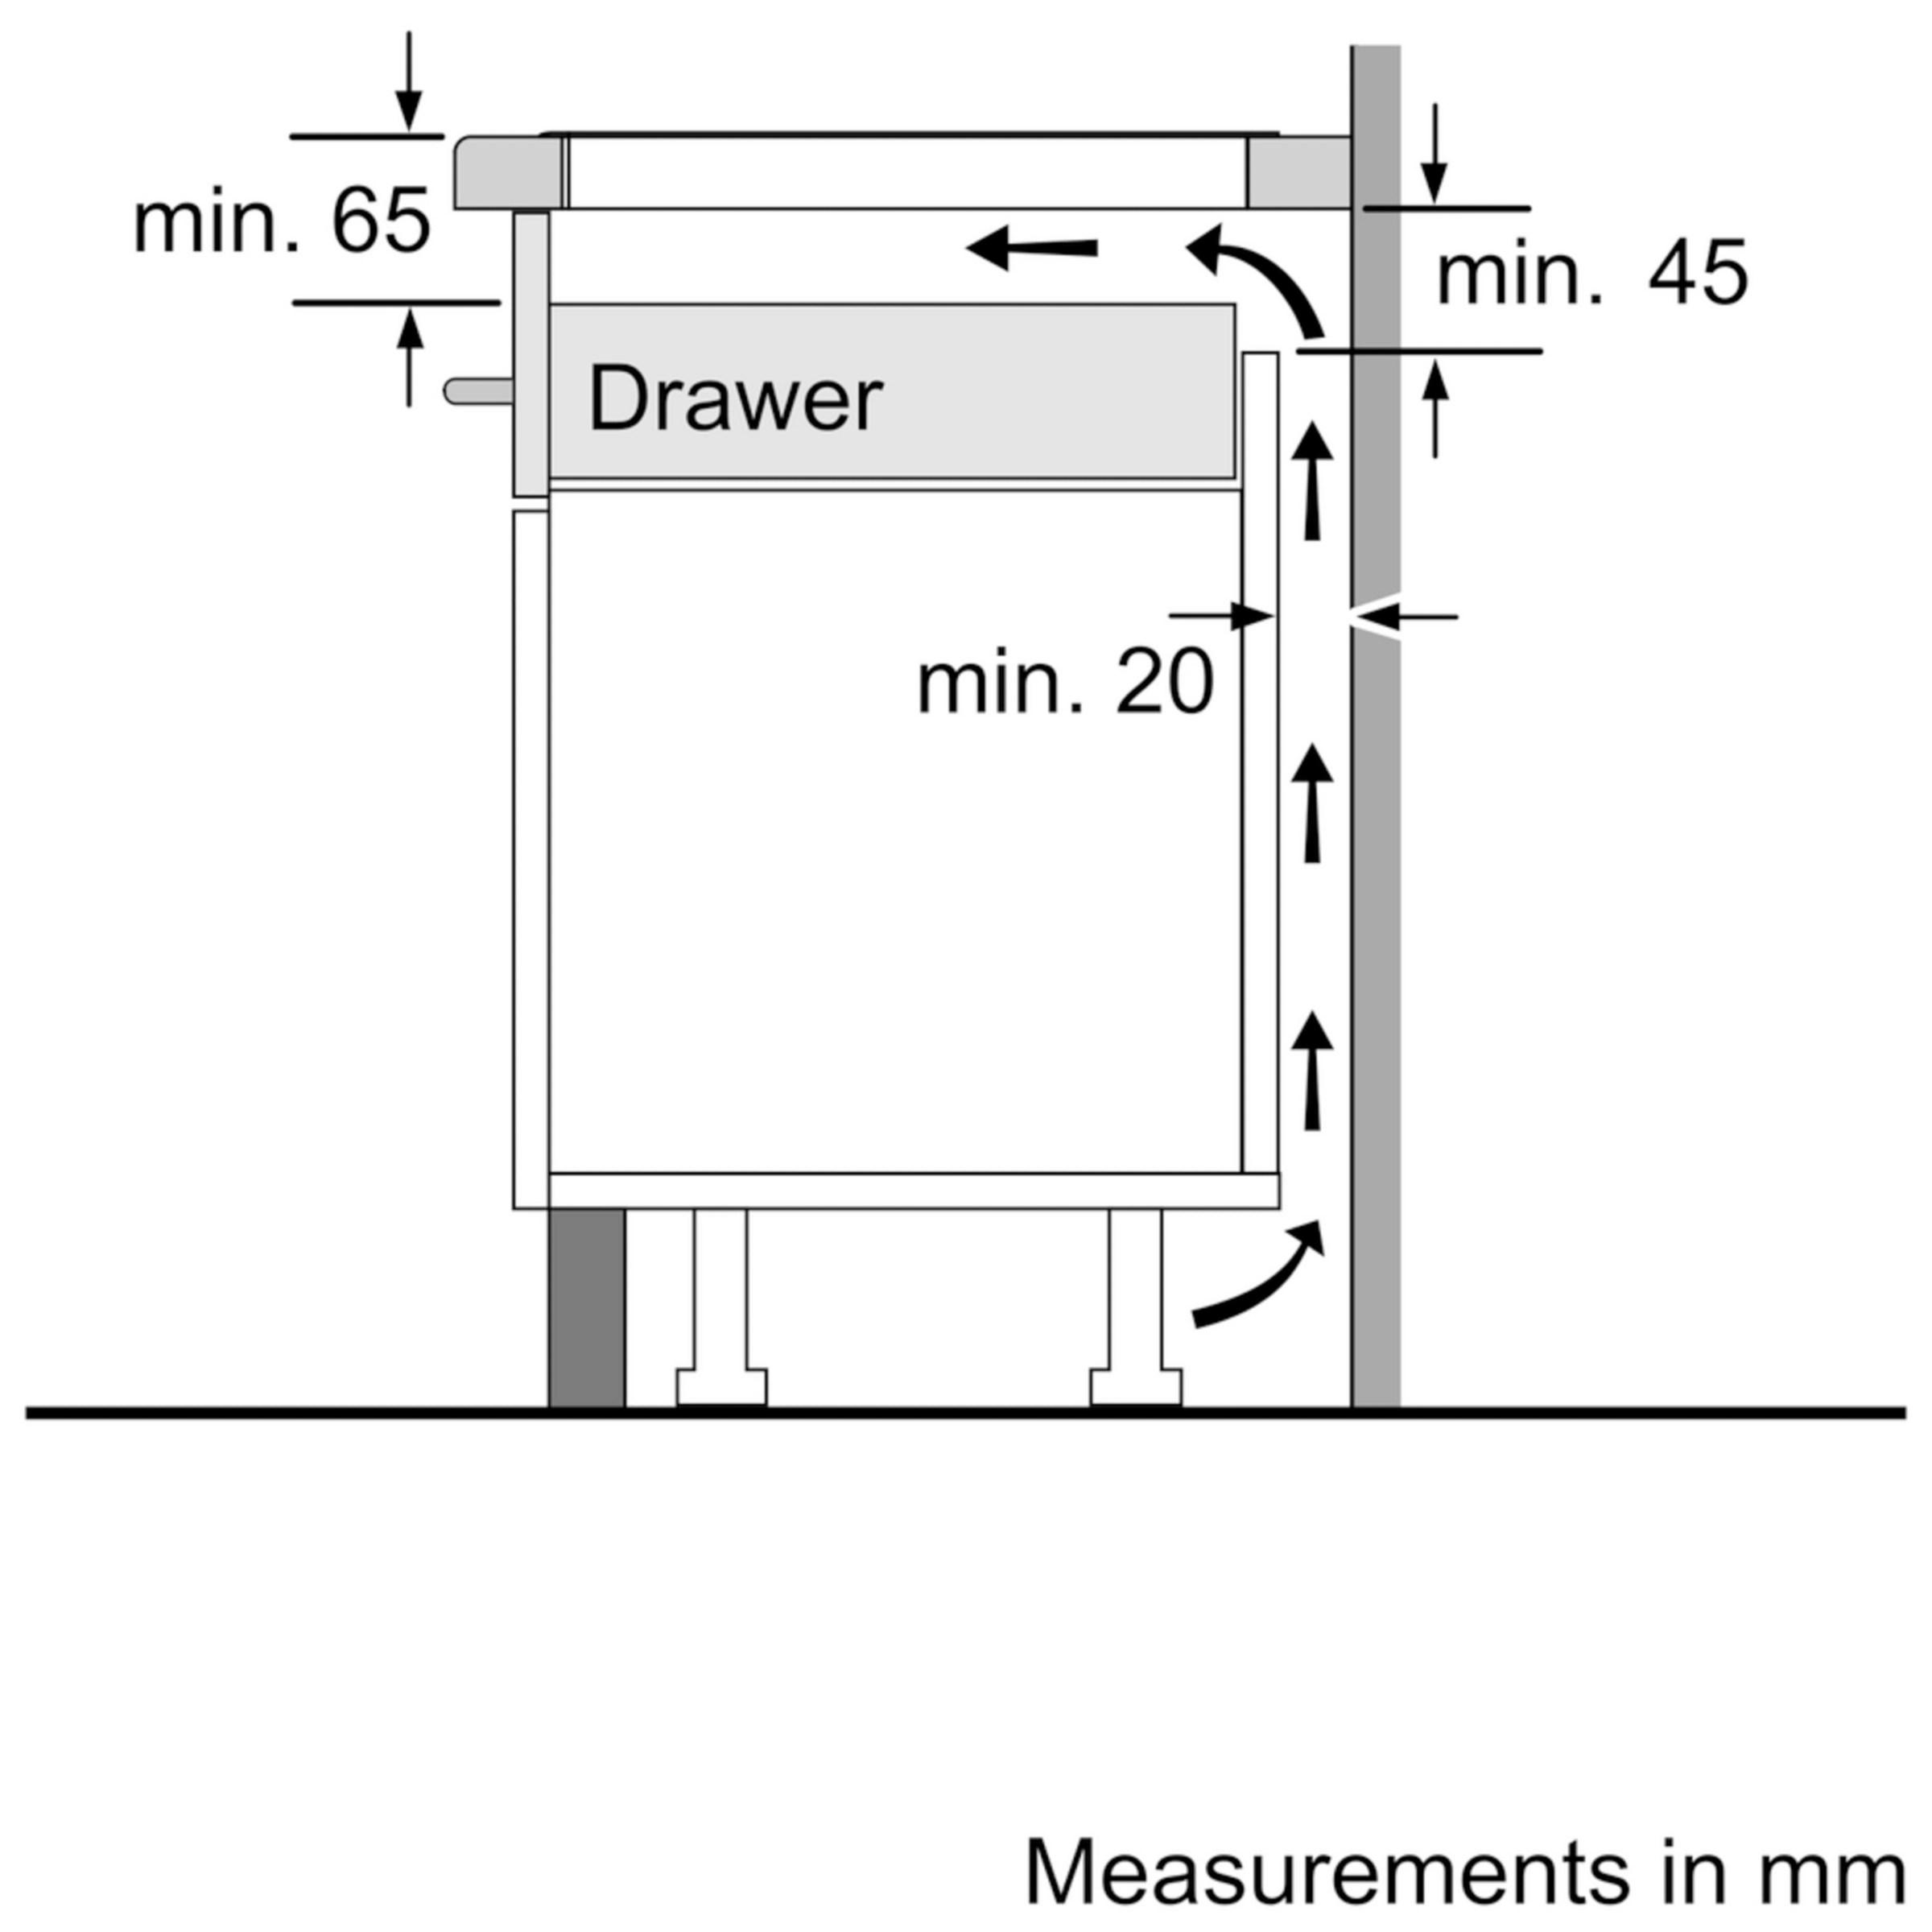 buyneff t46fd53x0 induction hob black glass online at johnlewis com  [ 1440 x 1920 Pixel ]